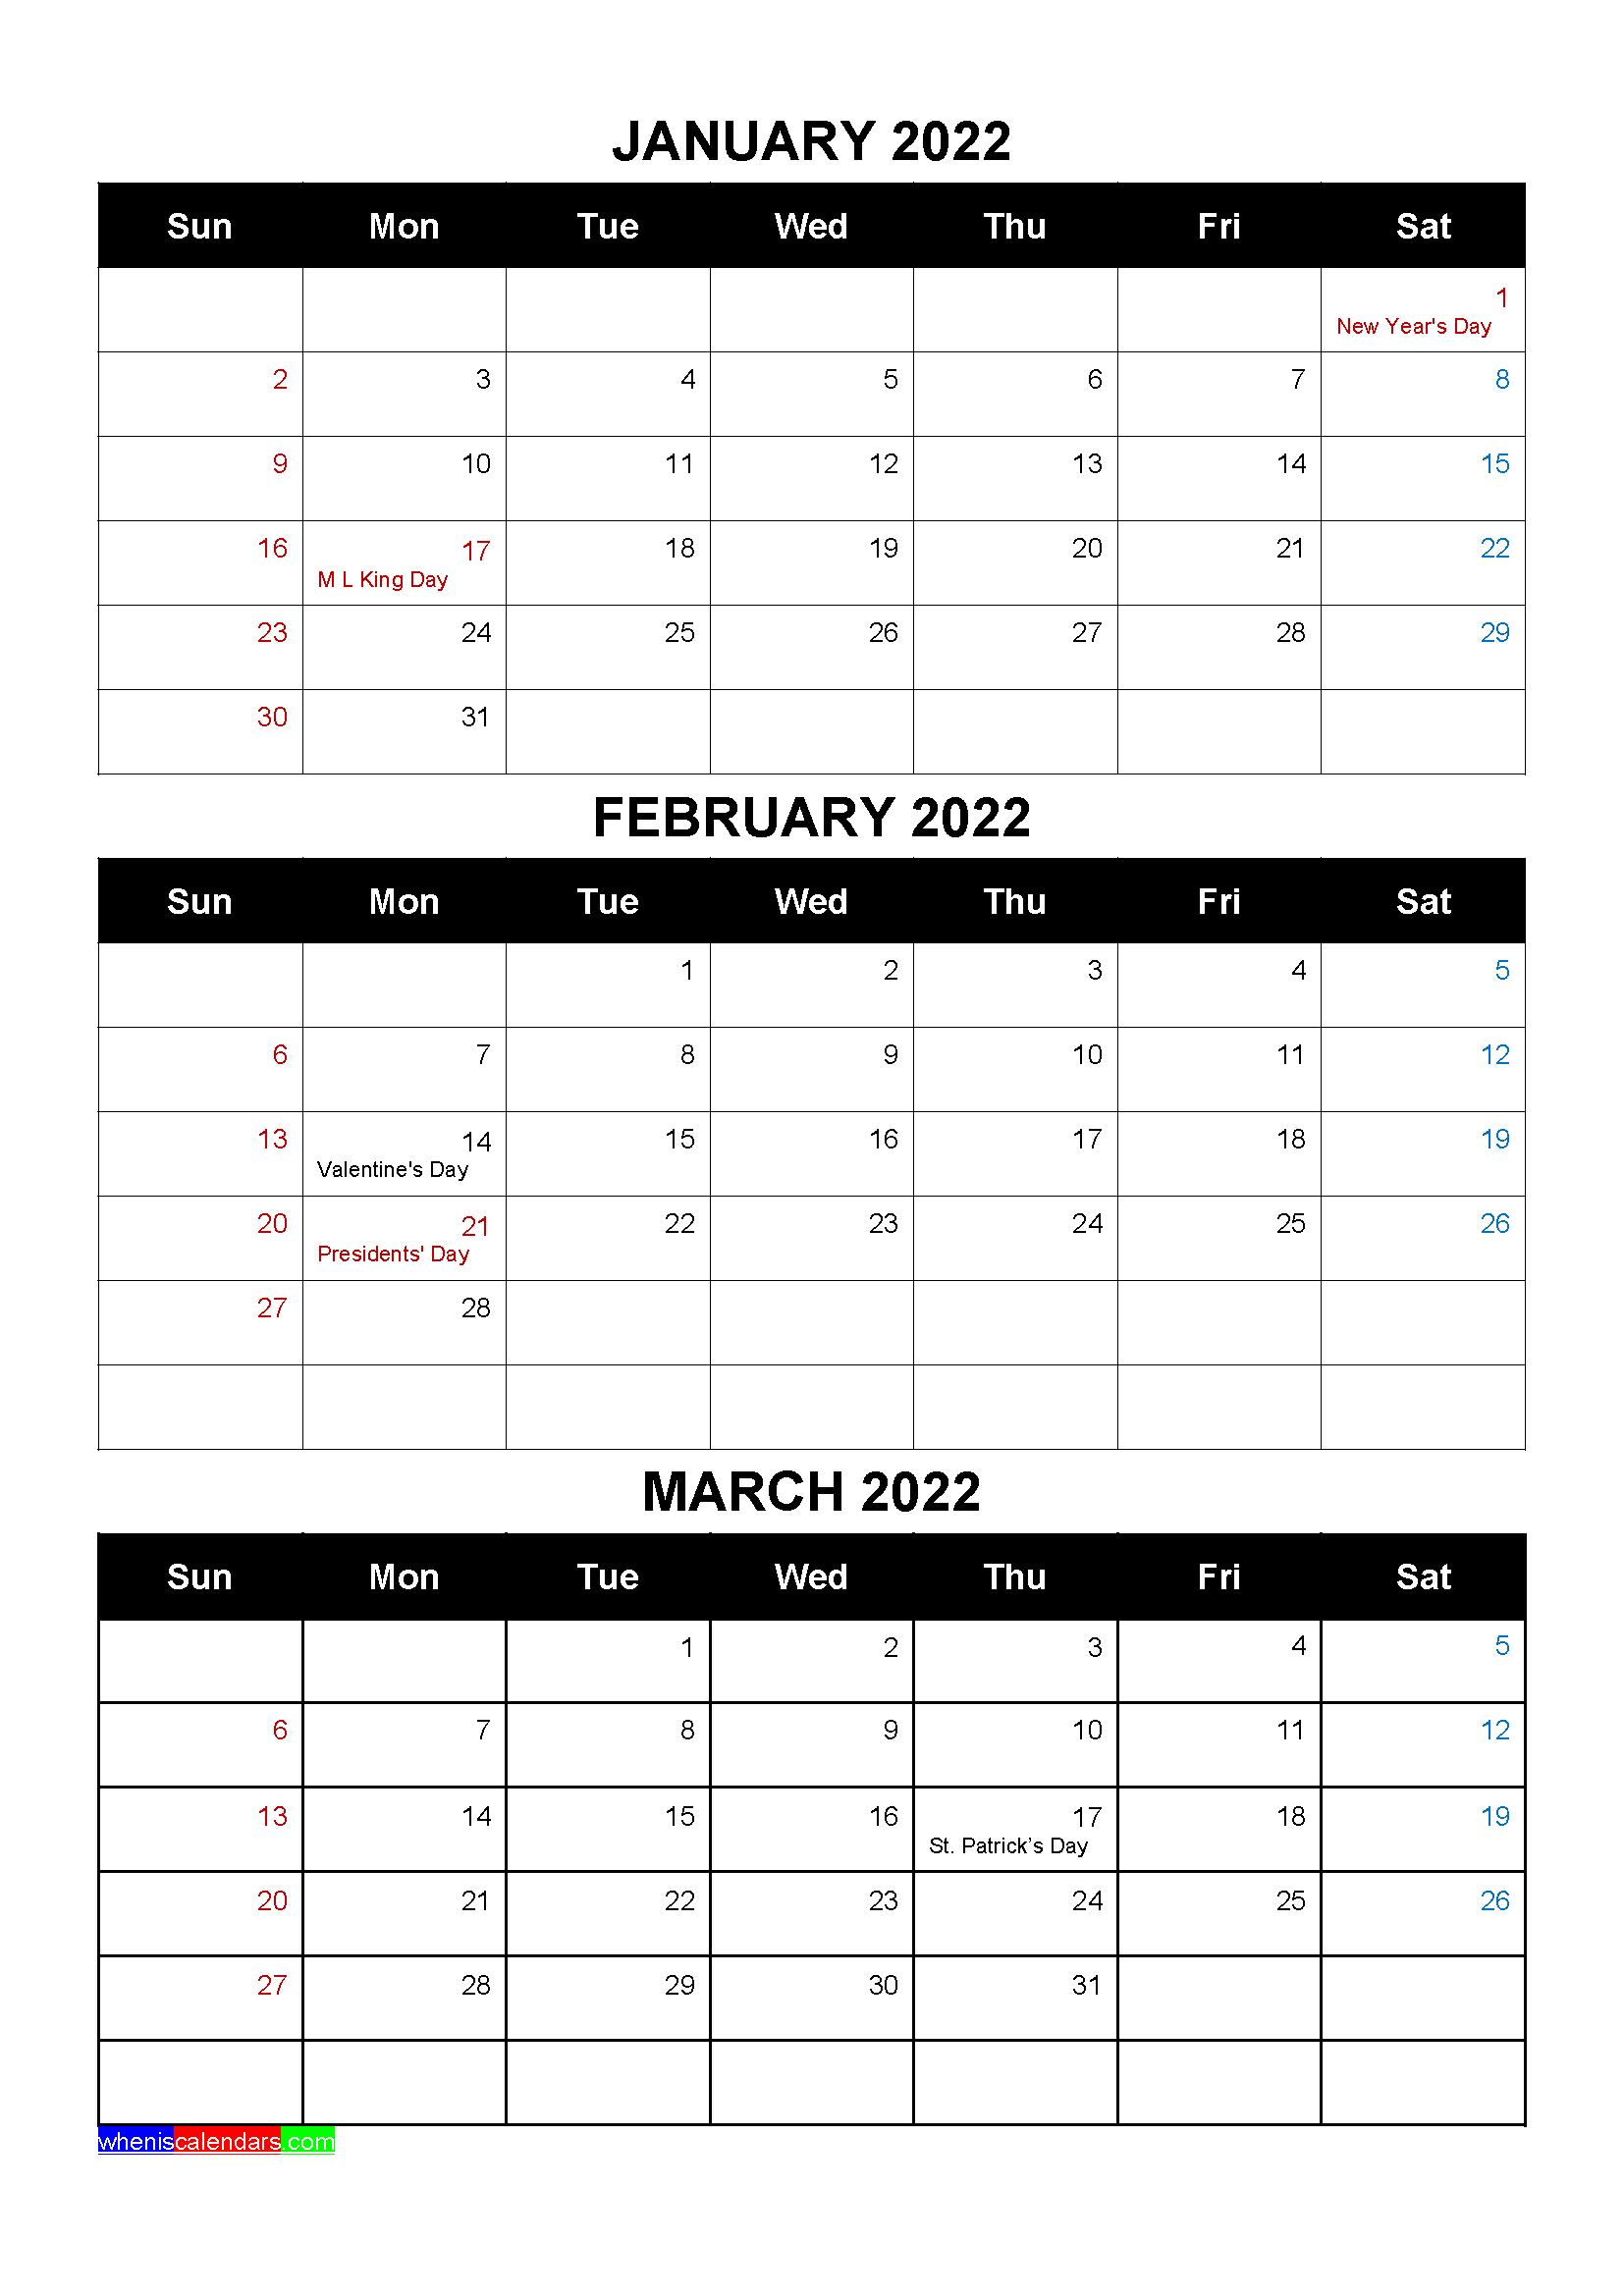 Free Calendar January February March 2022 With Holidays Four Quarters In 2020 January February March Free Calendar Calendar Printables